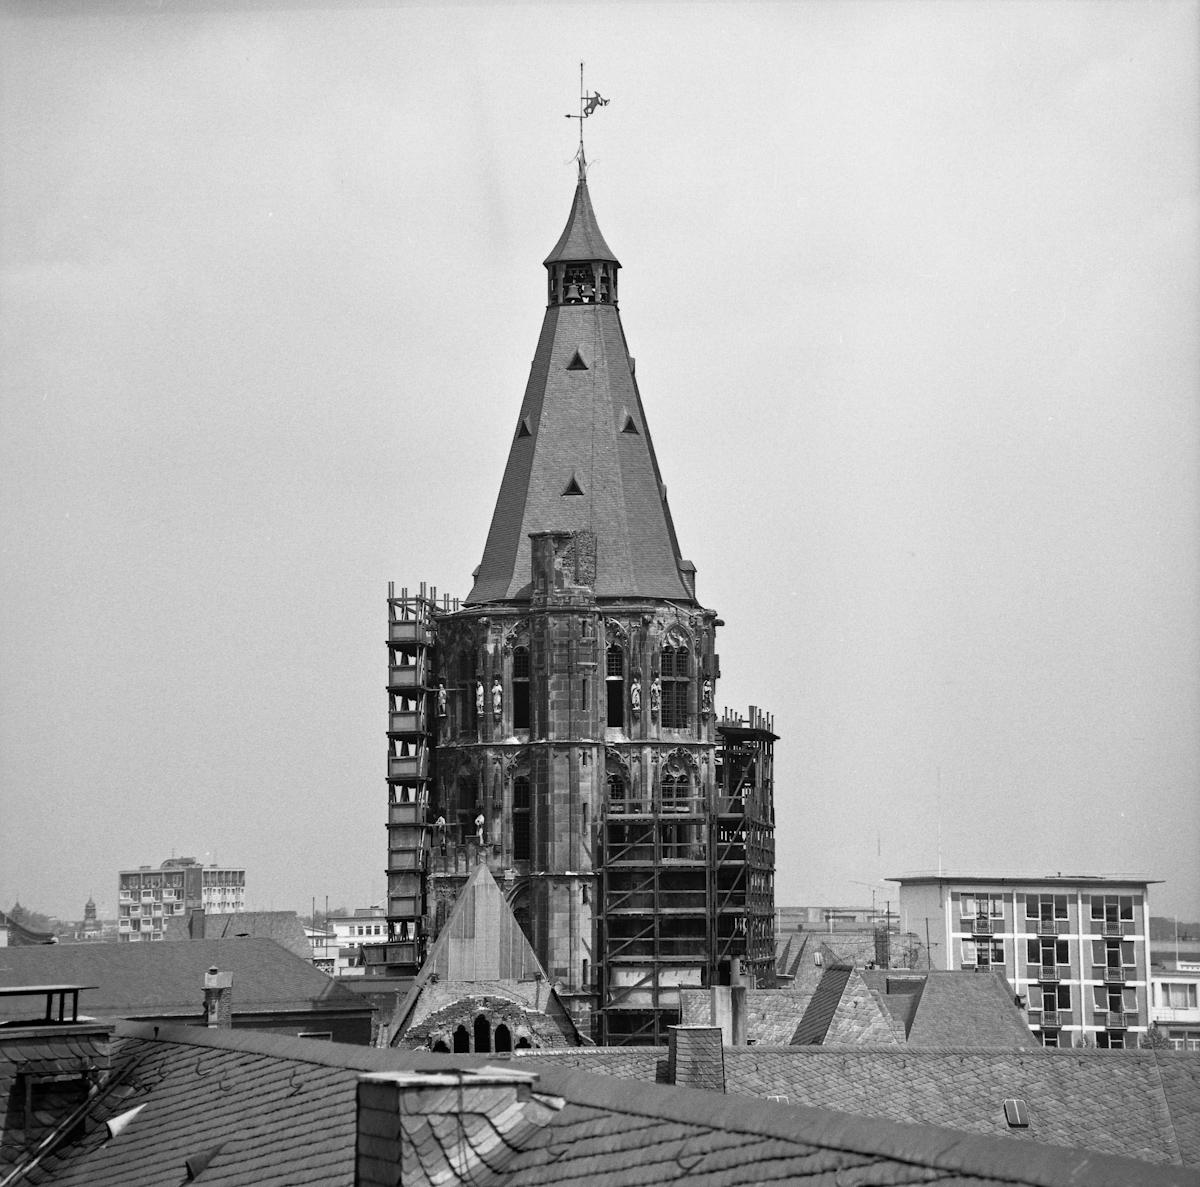 53761-Rathausturm-Koln